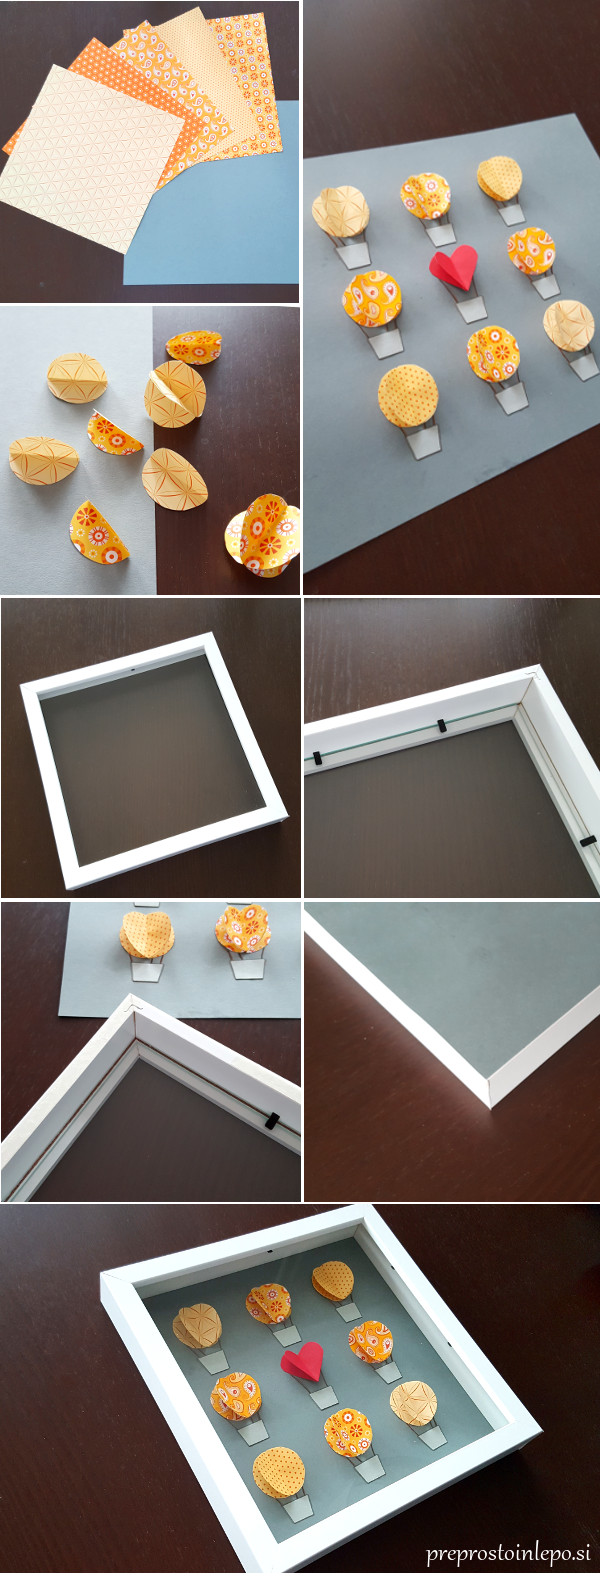 3d-slika-v-okvirju